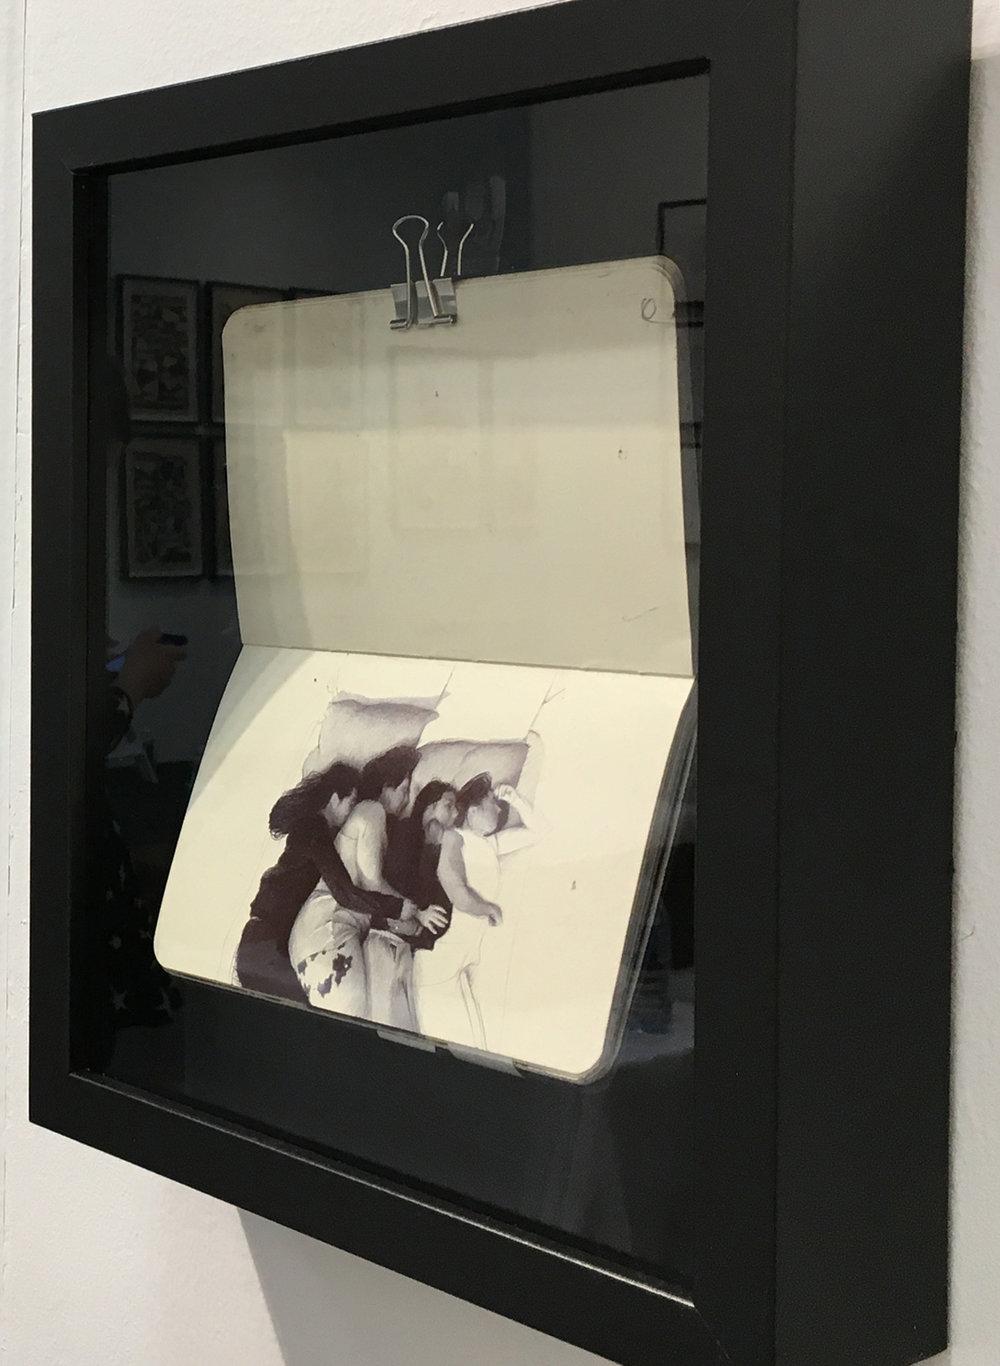 Sketchbook from artist's commute   2017 ballpoint pen in Moleskin sketchbook 3.5 x 5.5 inches